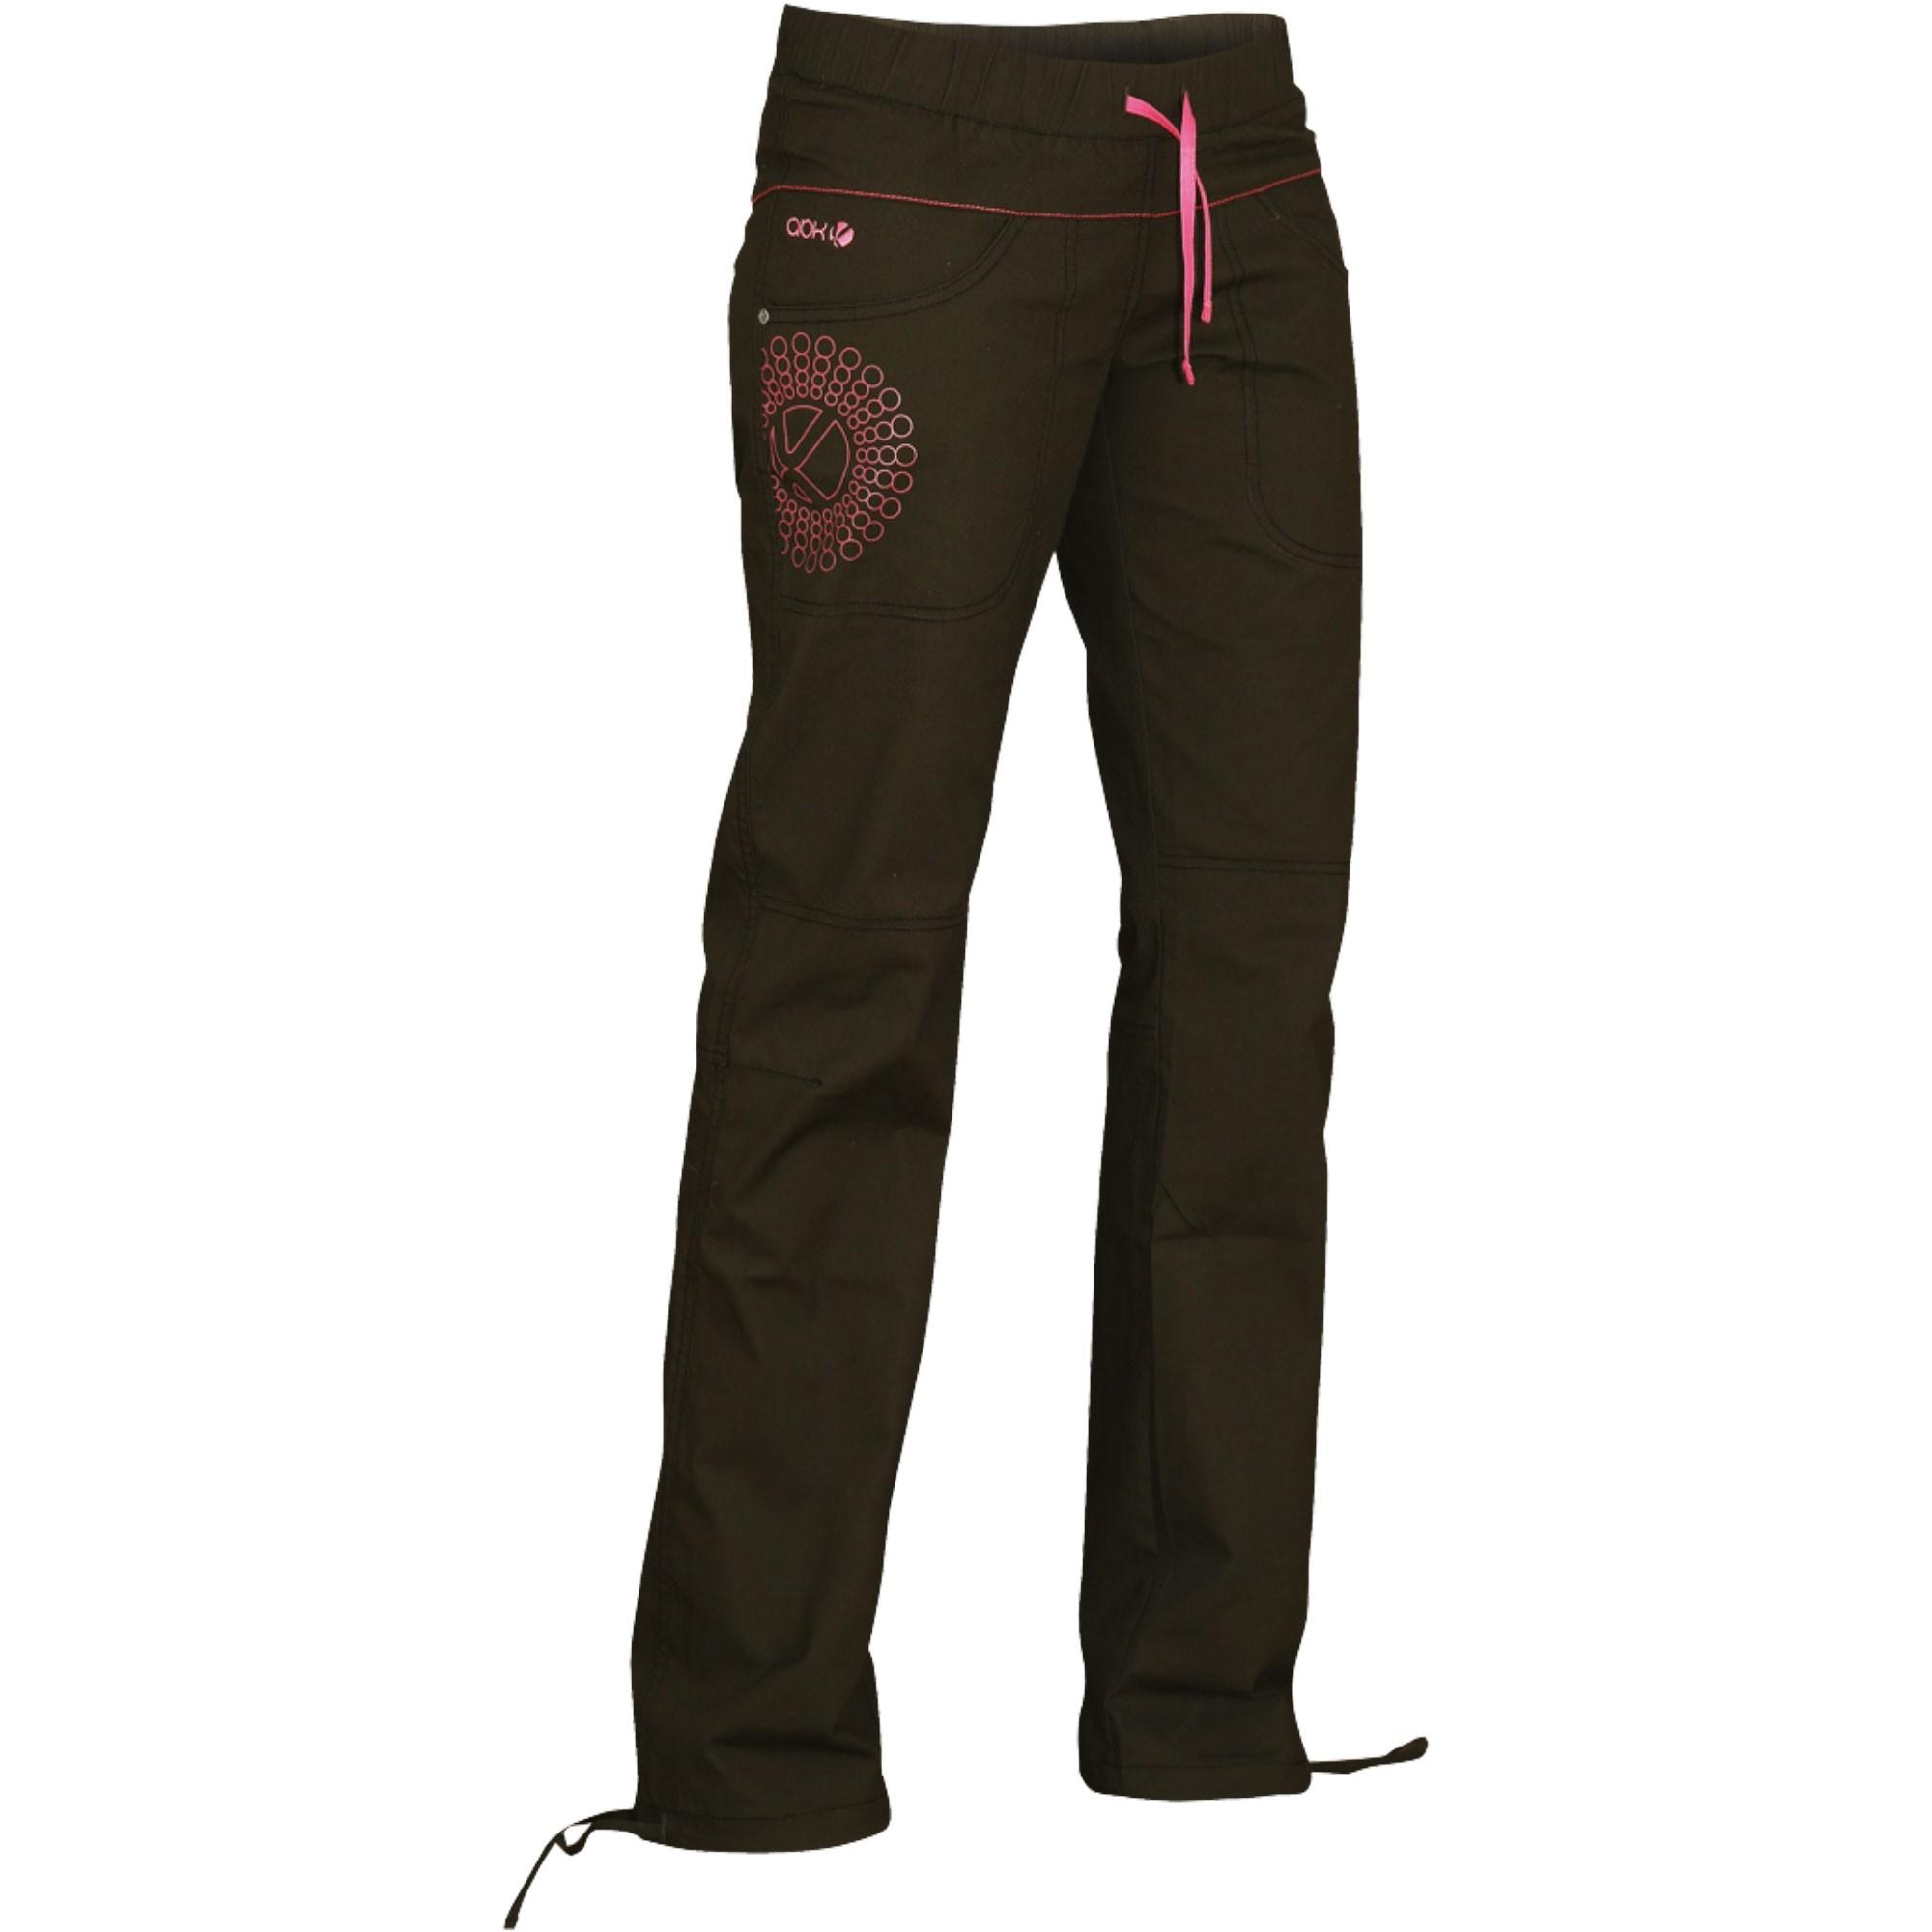 ABK - Vire V2 Climbing Pants - Black